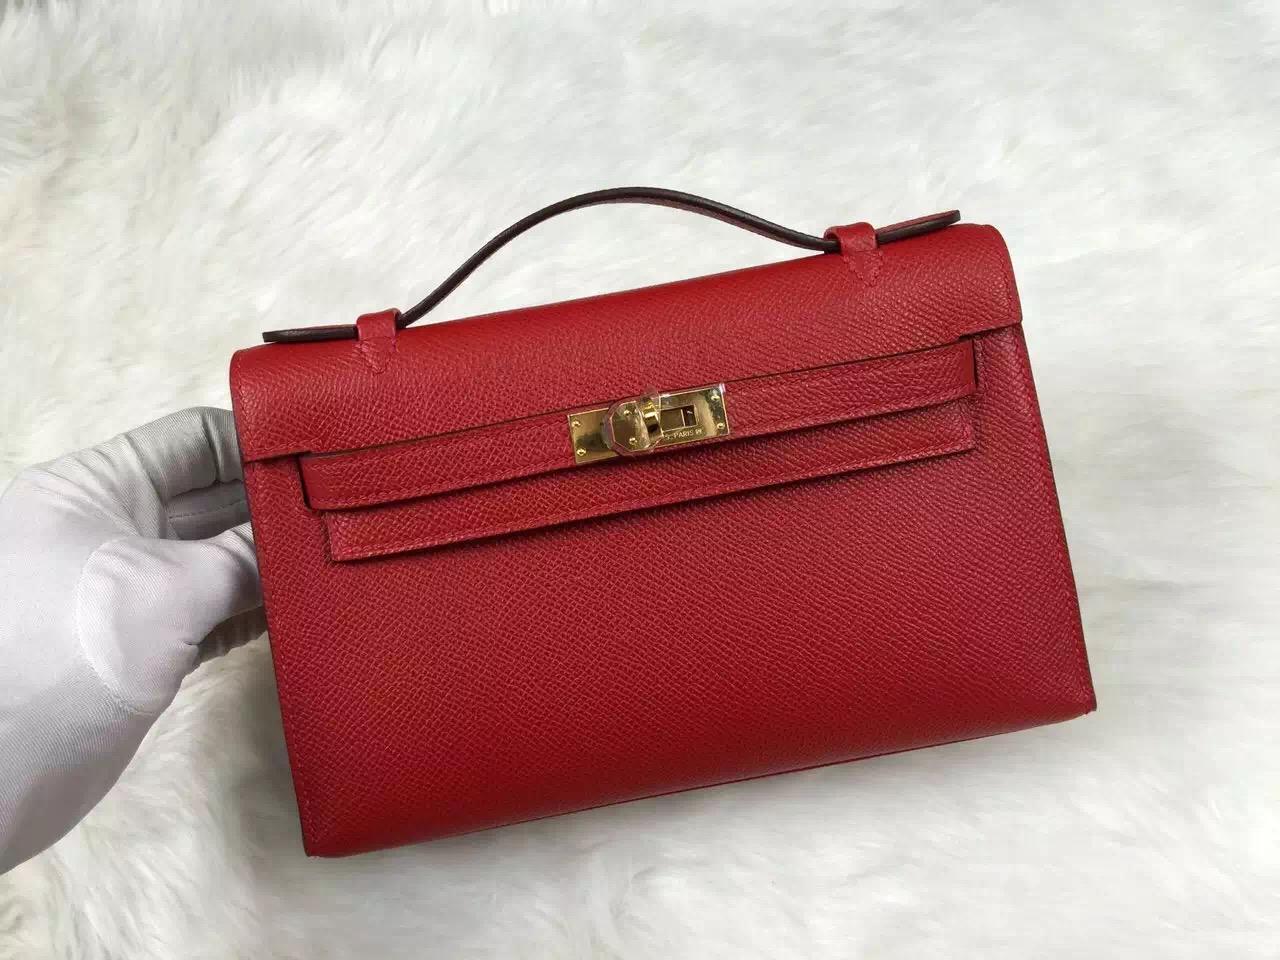 Cheap Hermes Mini Kelly Q5 Chinese Red Epsom Calfskin Leather Ladies' Handbag